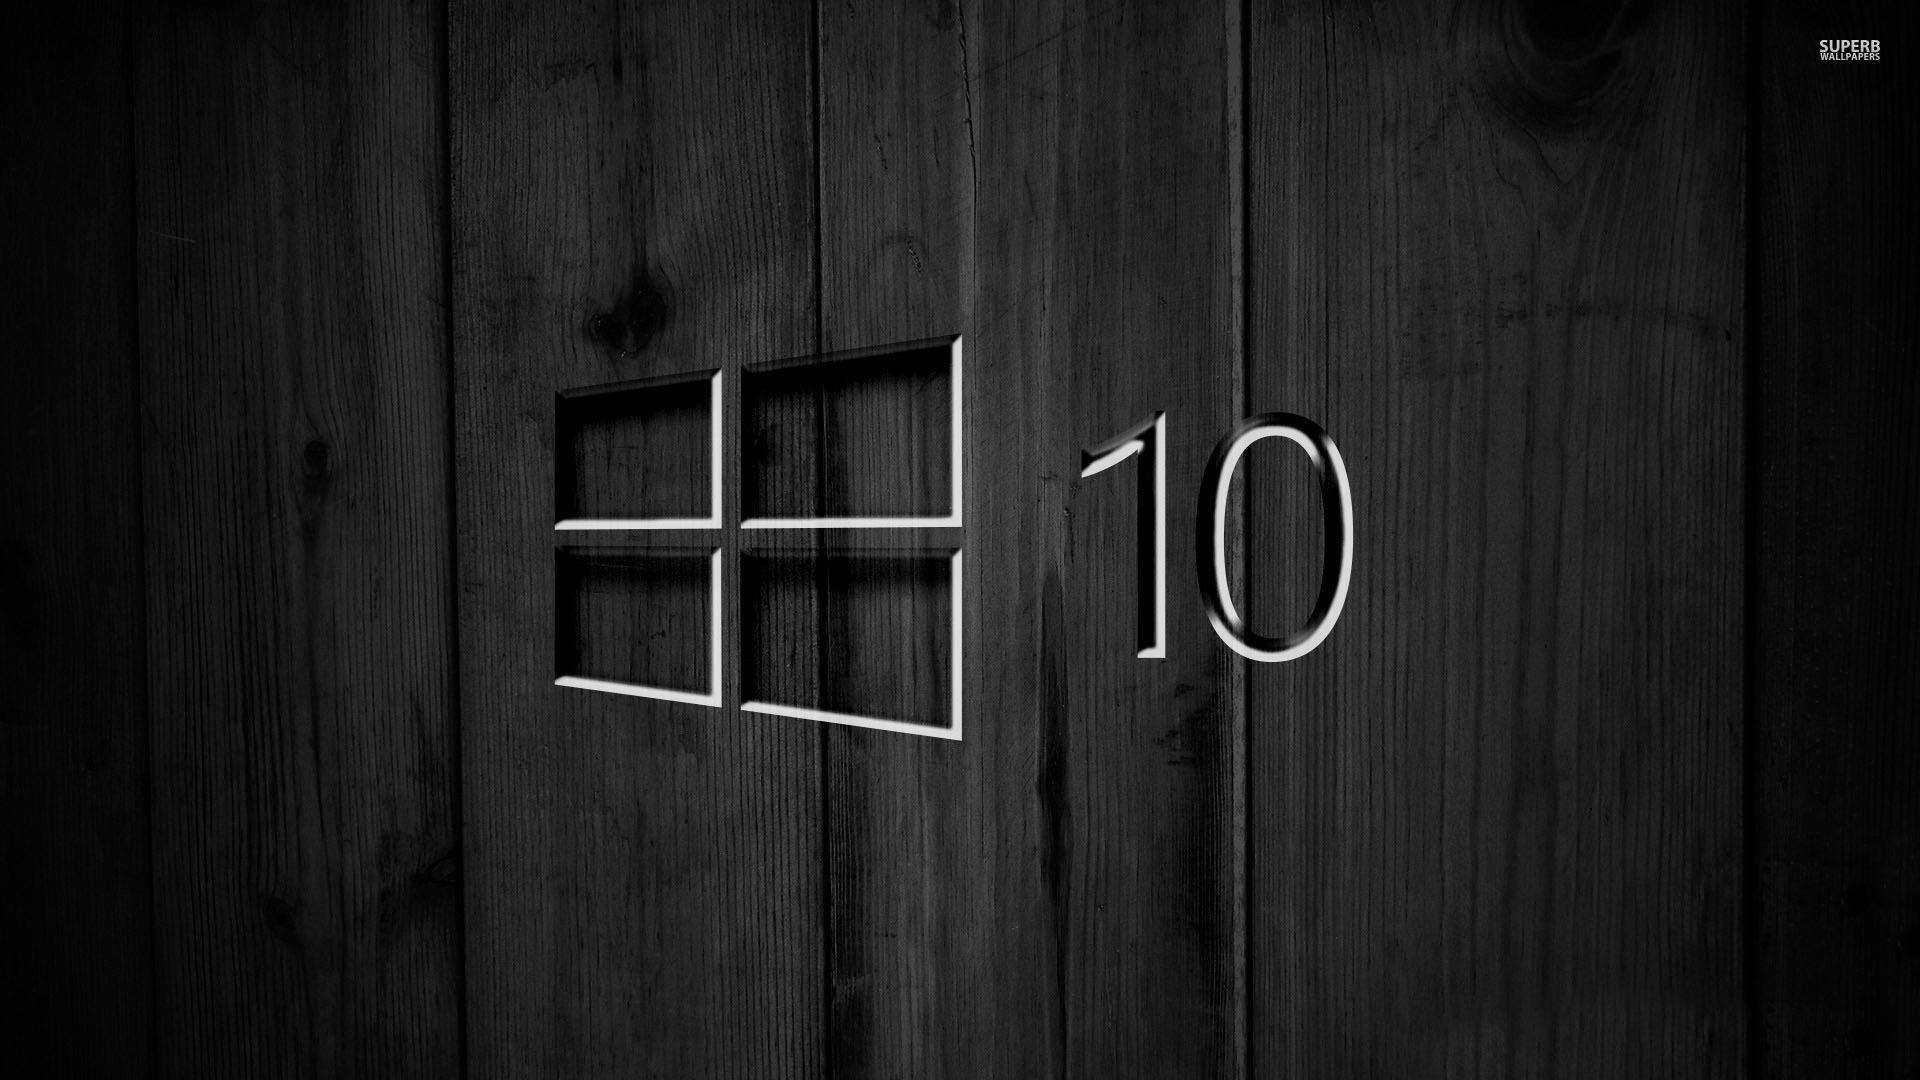 Windows 10 wallpaper hd 3d for desktop 5 supportive guru for Immagini 3d hd